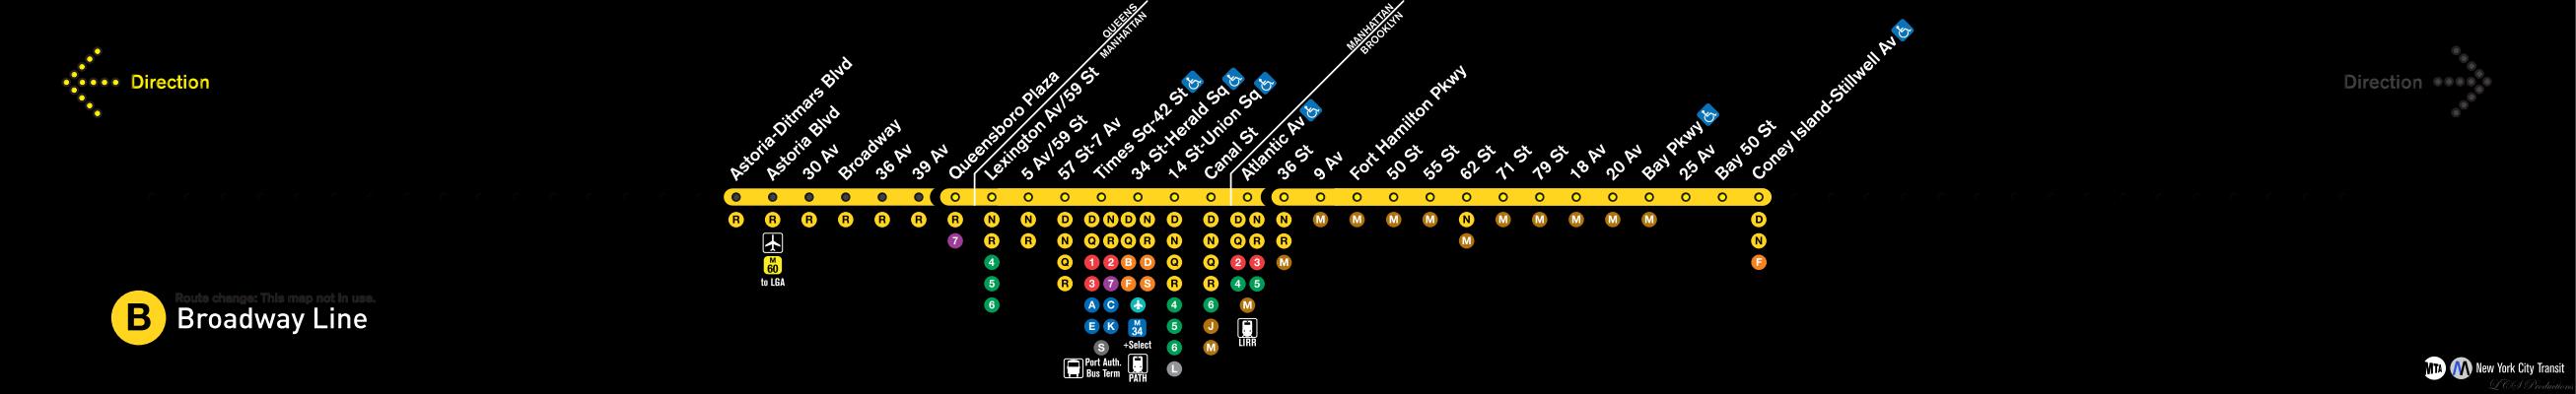 Subway Map R Train.R142 143 Strip Maps Version 3 0 Artwork And Graphic Design Nyc